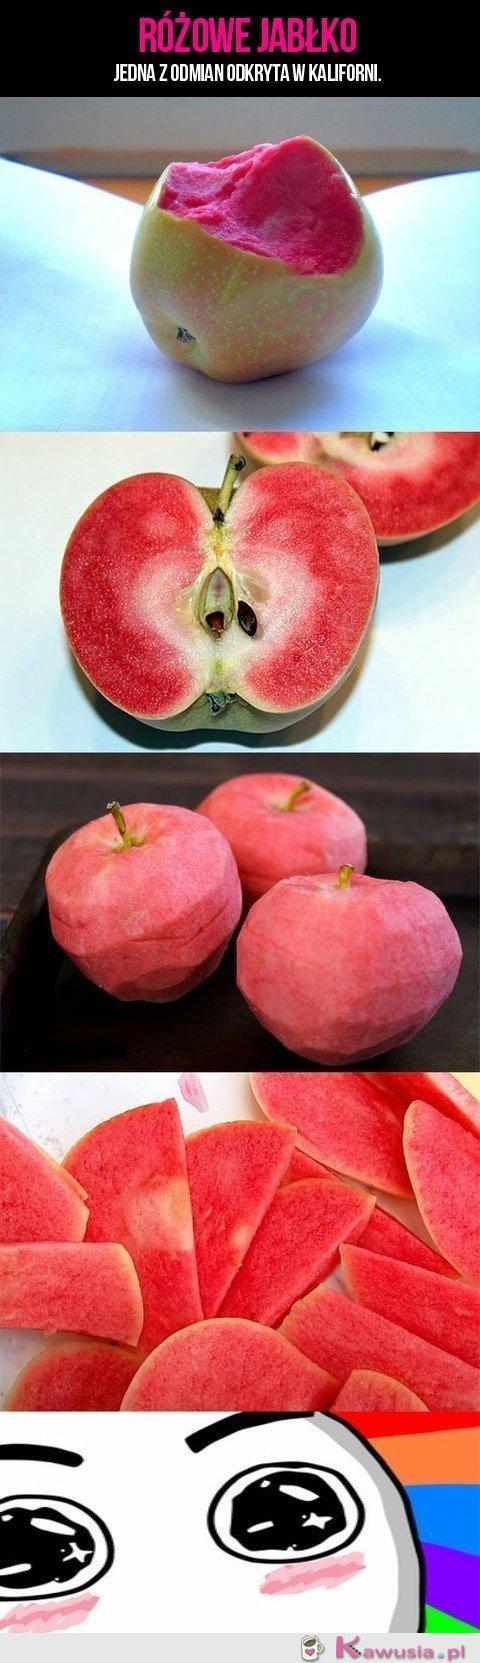 Różowe jabłko